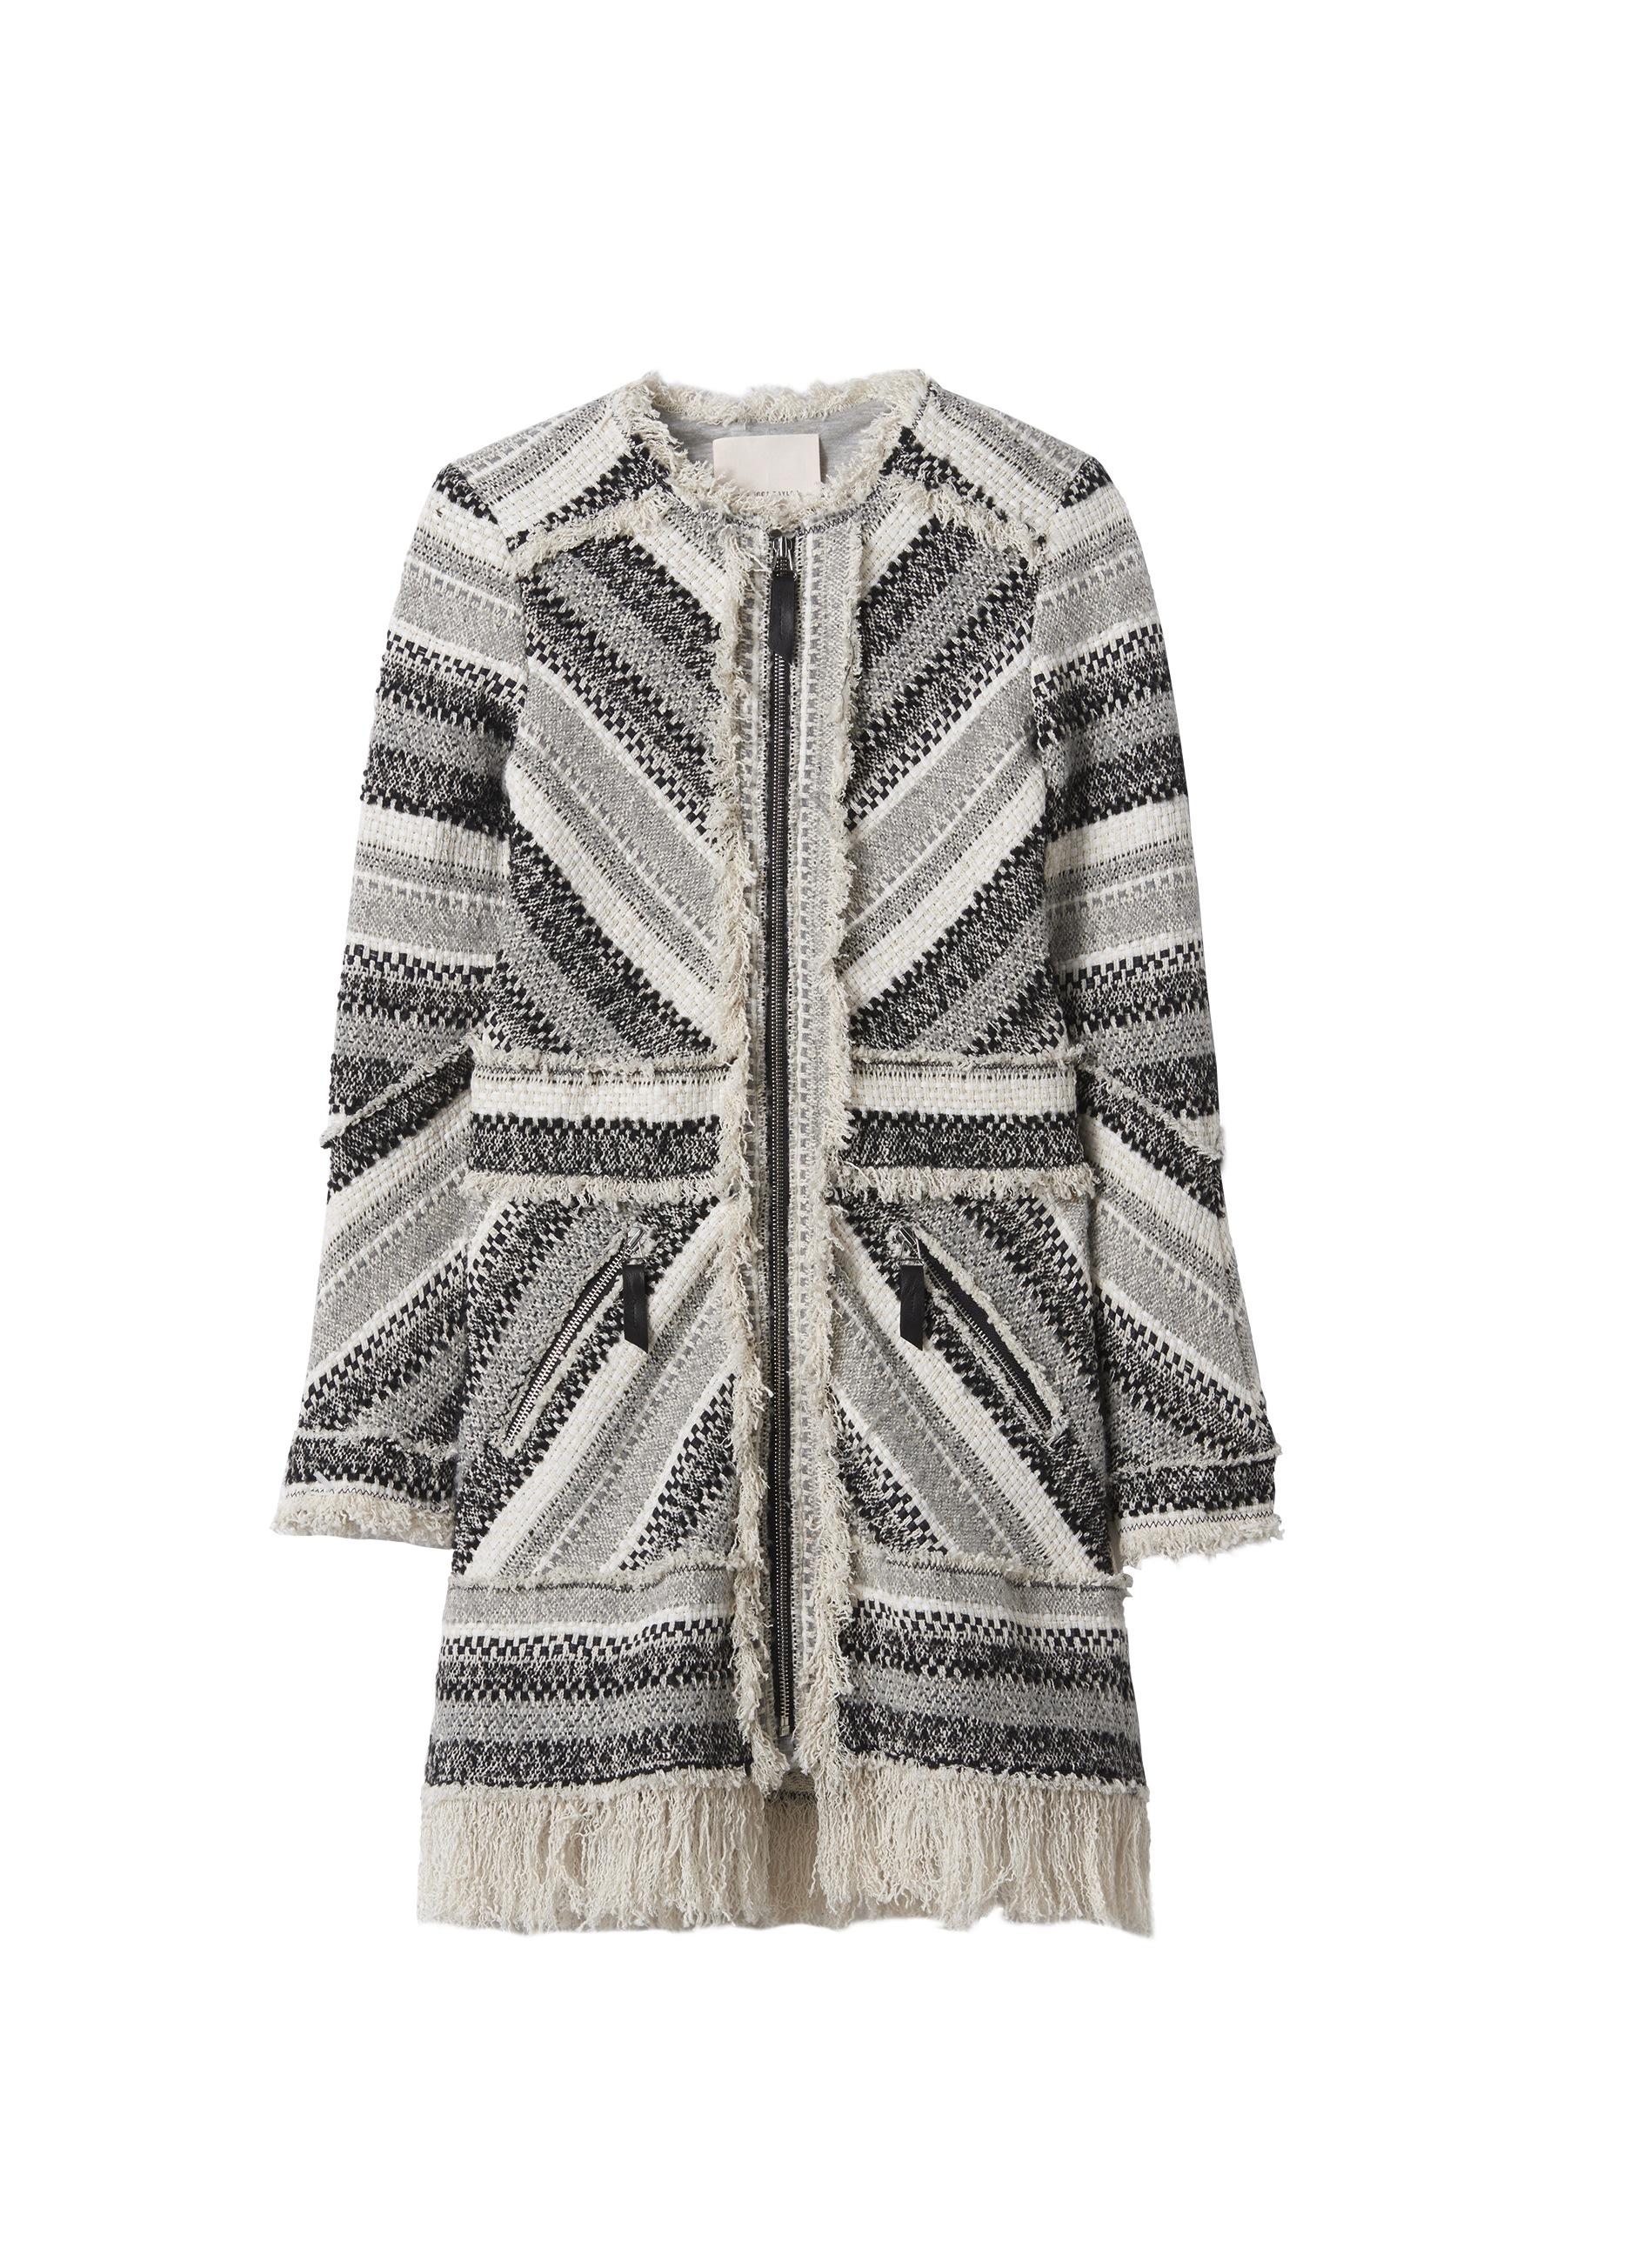 image: fringe wool hooded coat, rebecca taylor & rebeccataylor.com